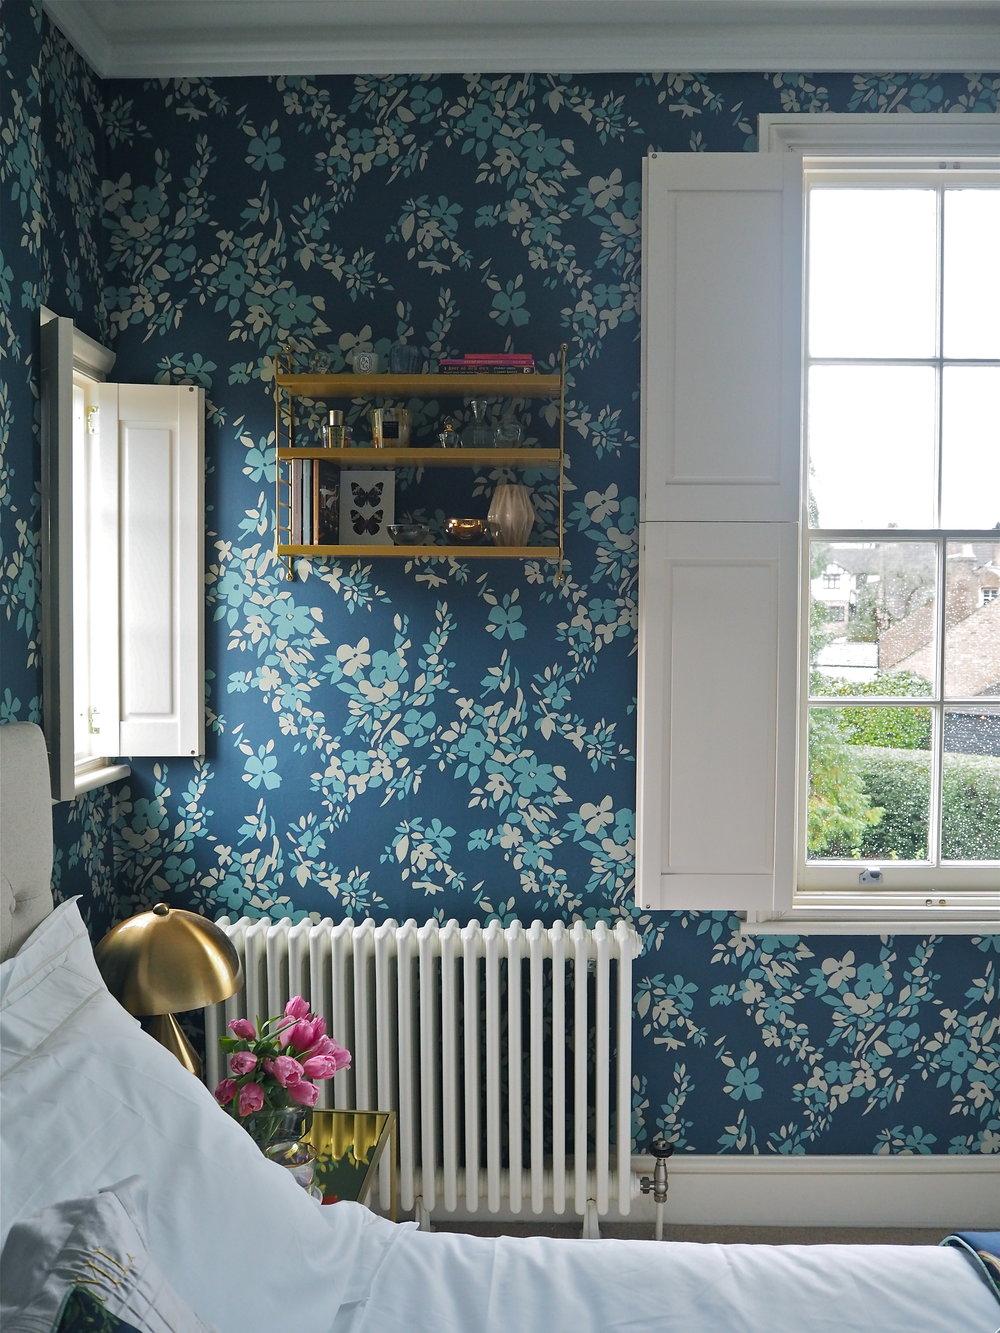 farrow ball wallpaper hegemone